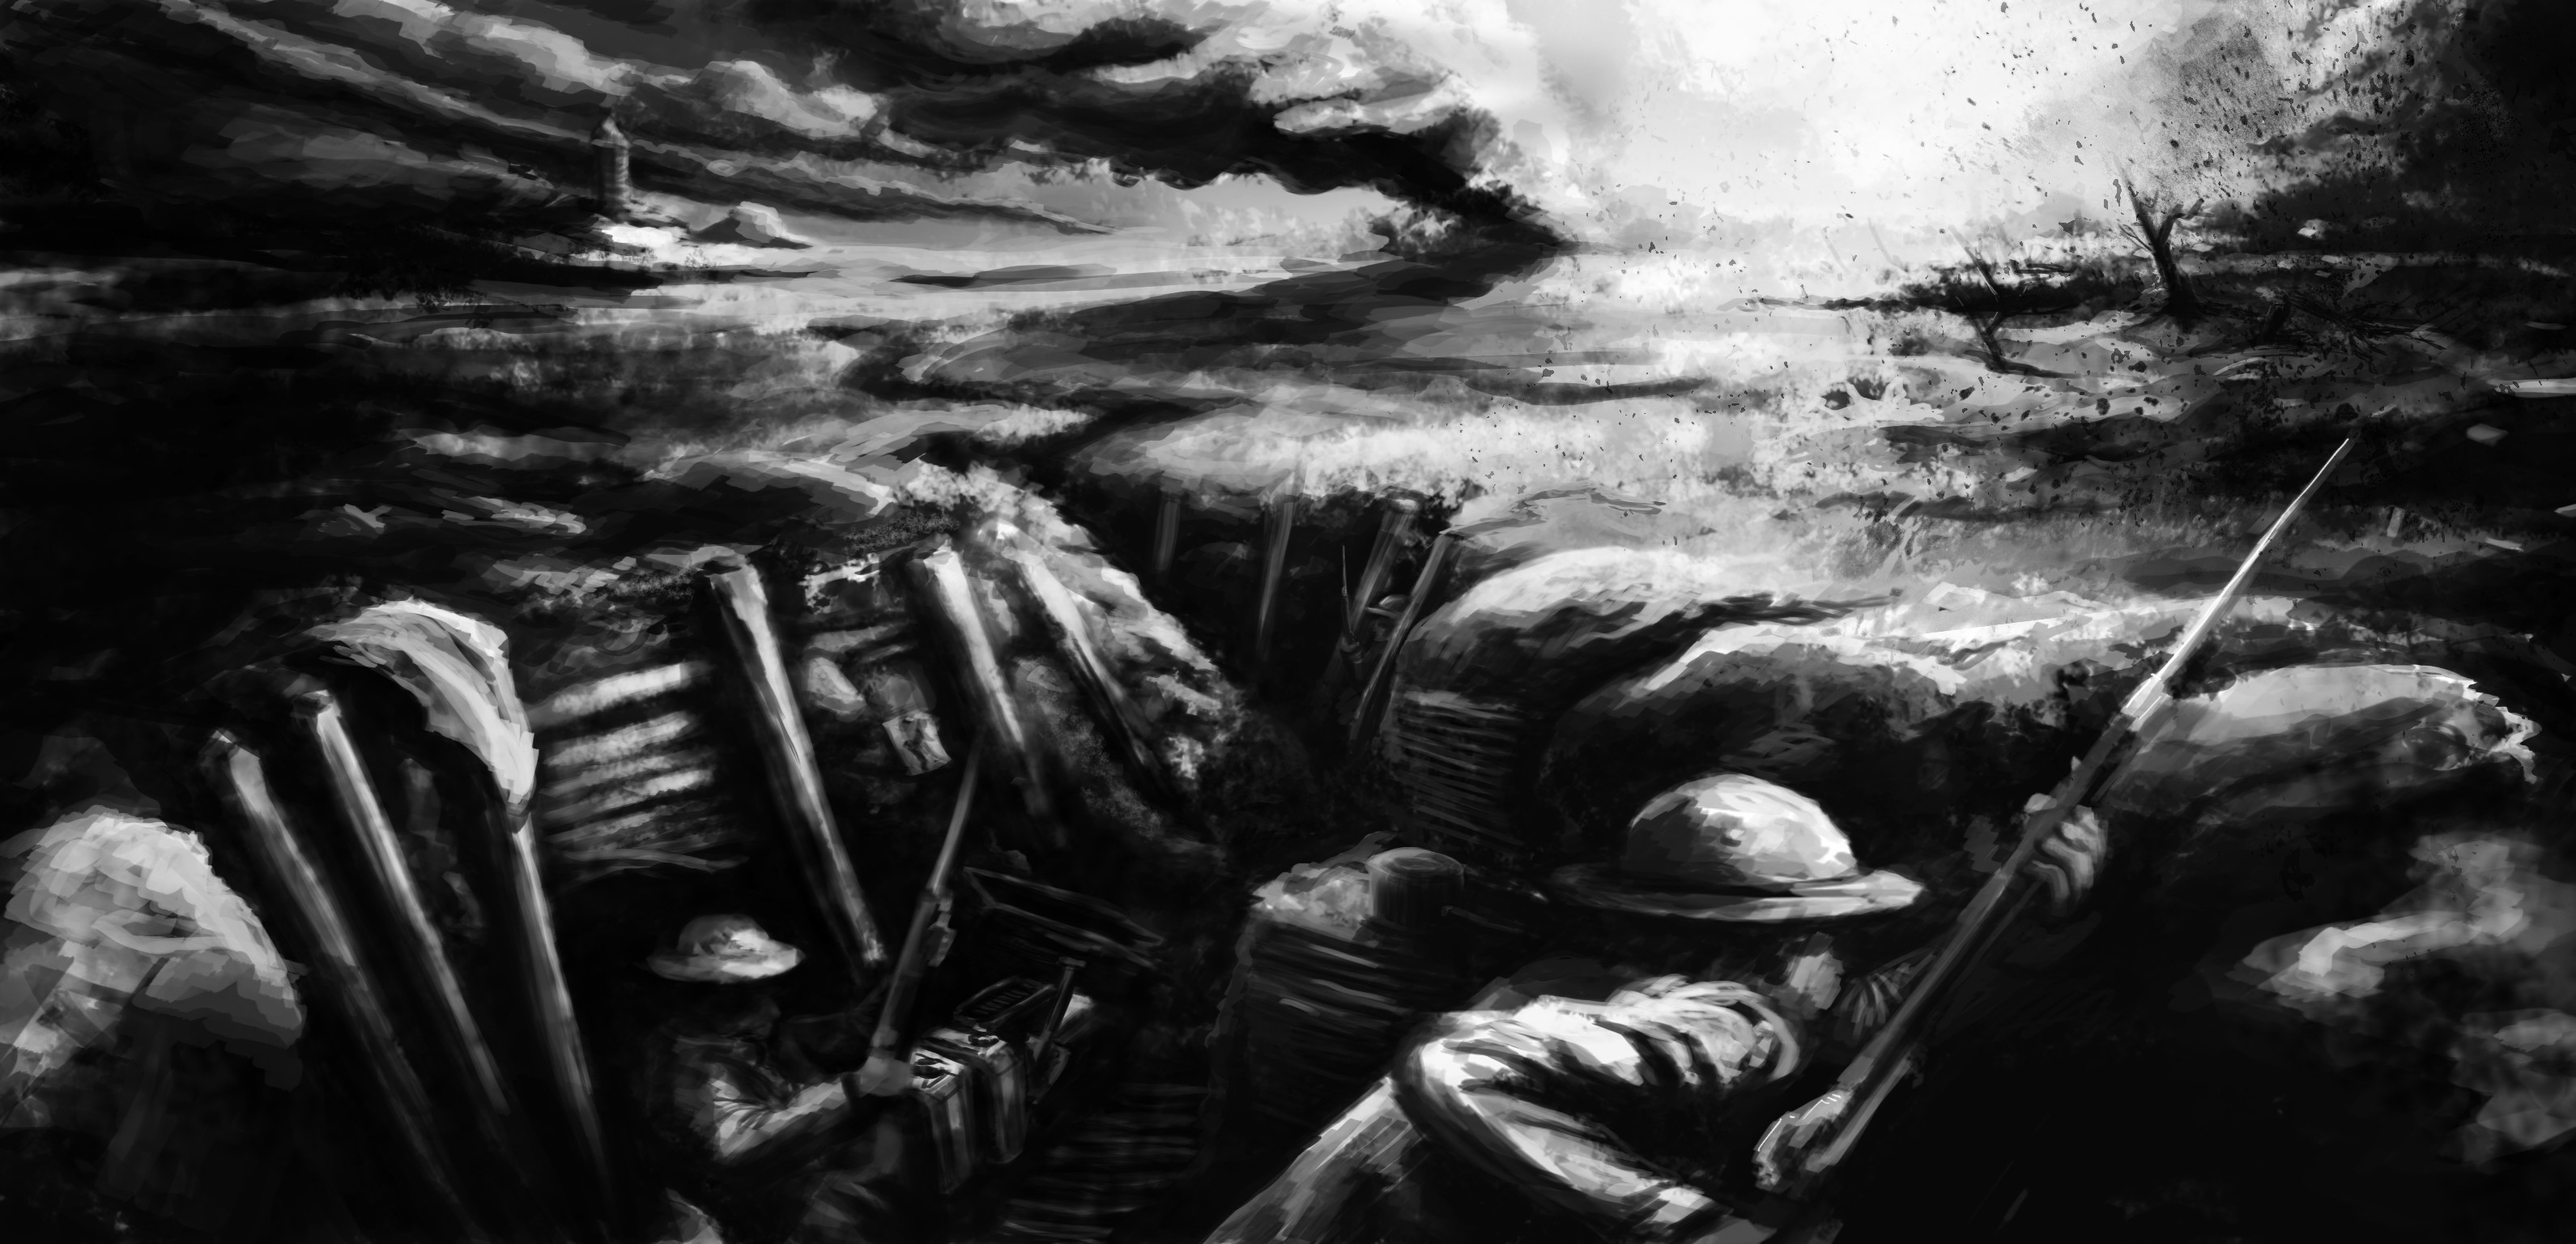 3840x2160 Battlefield 1 4K Wallpaper